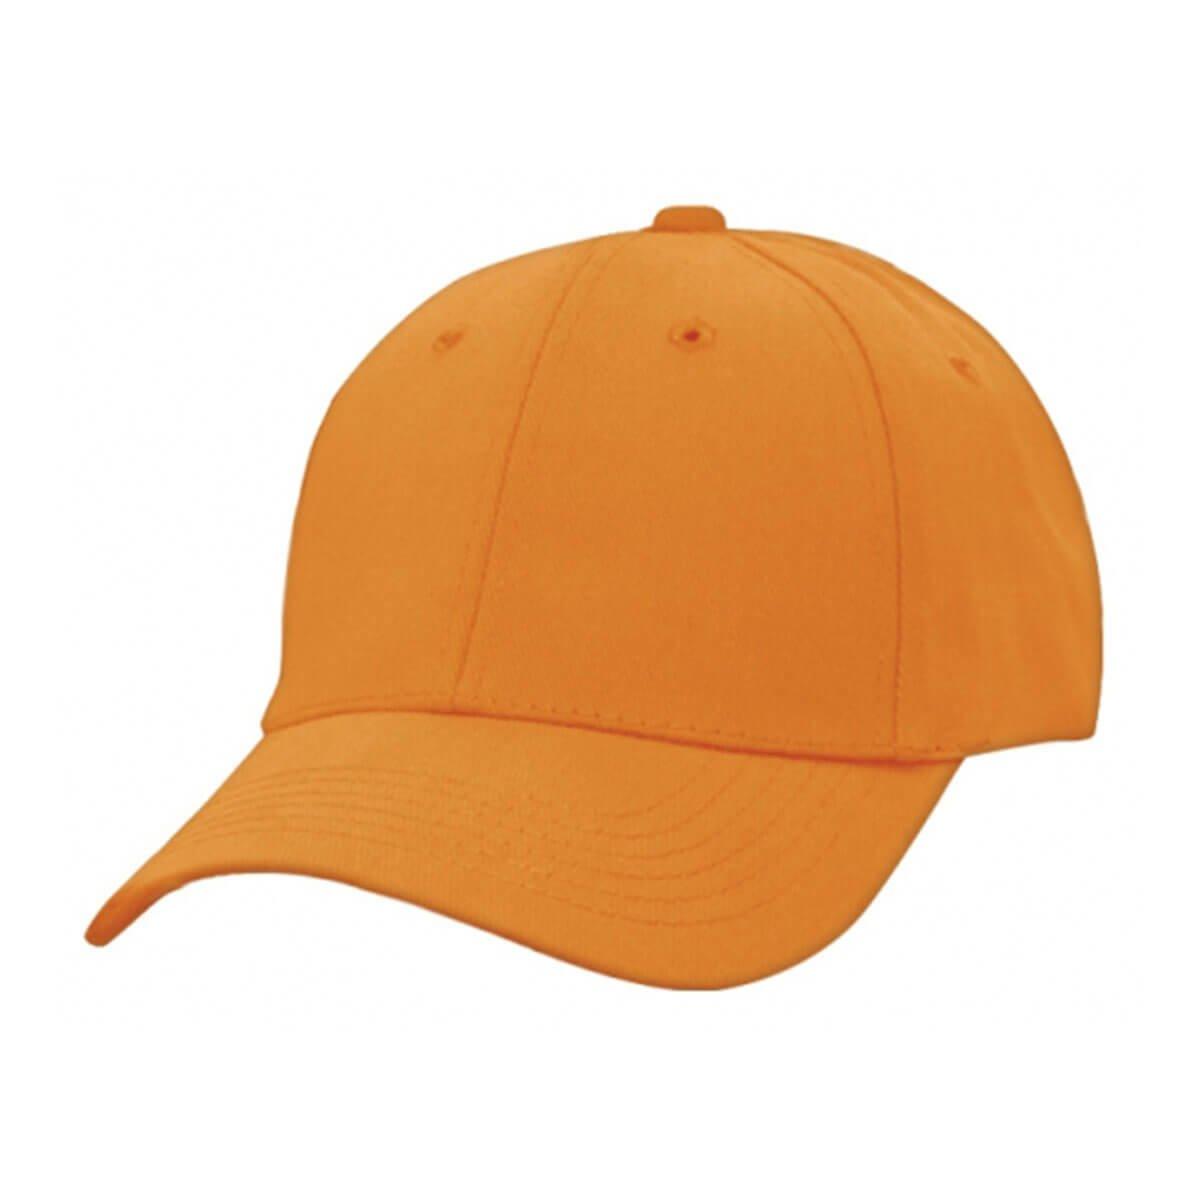 Heavy Brushed Cotton Cap-Ochre